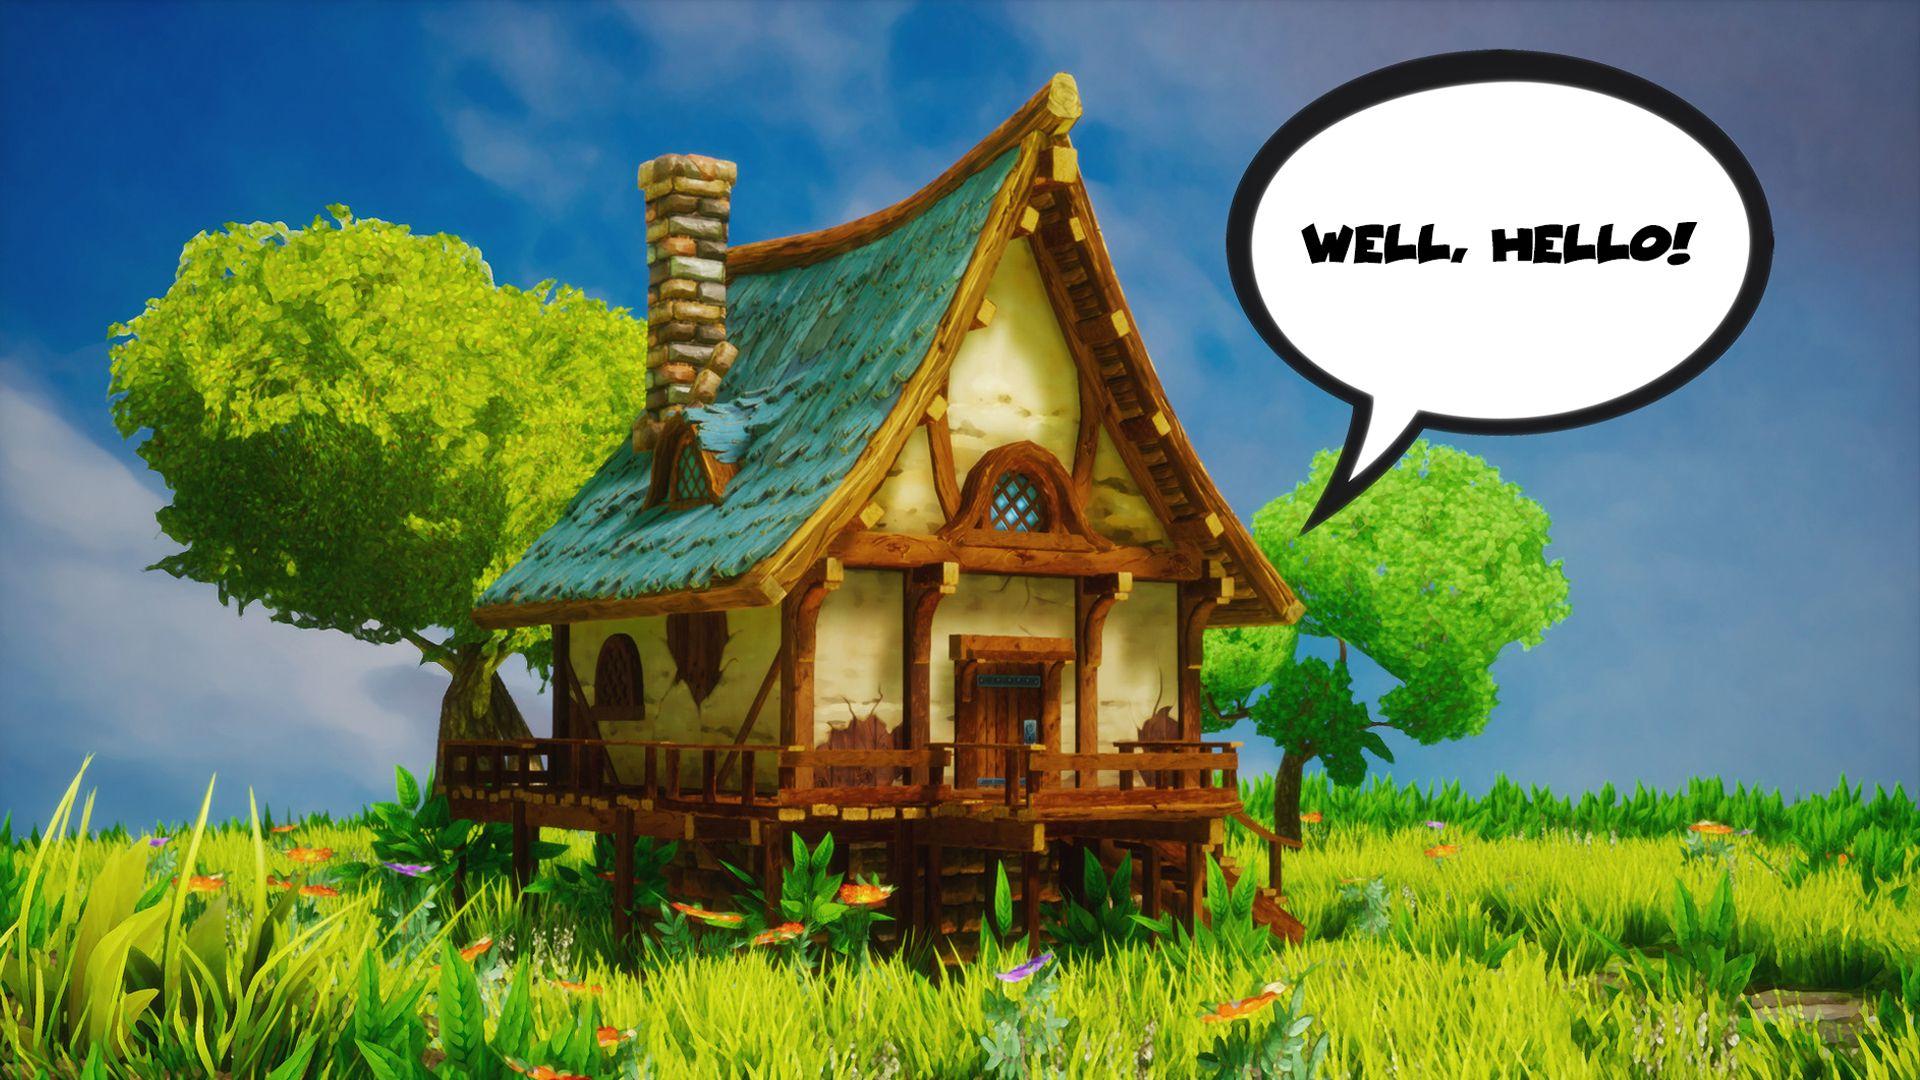 Unreal Engine 4 Stylized Rendering Workflow | Tutorials in